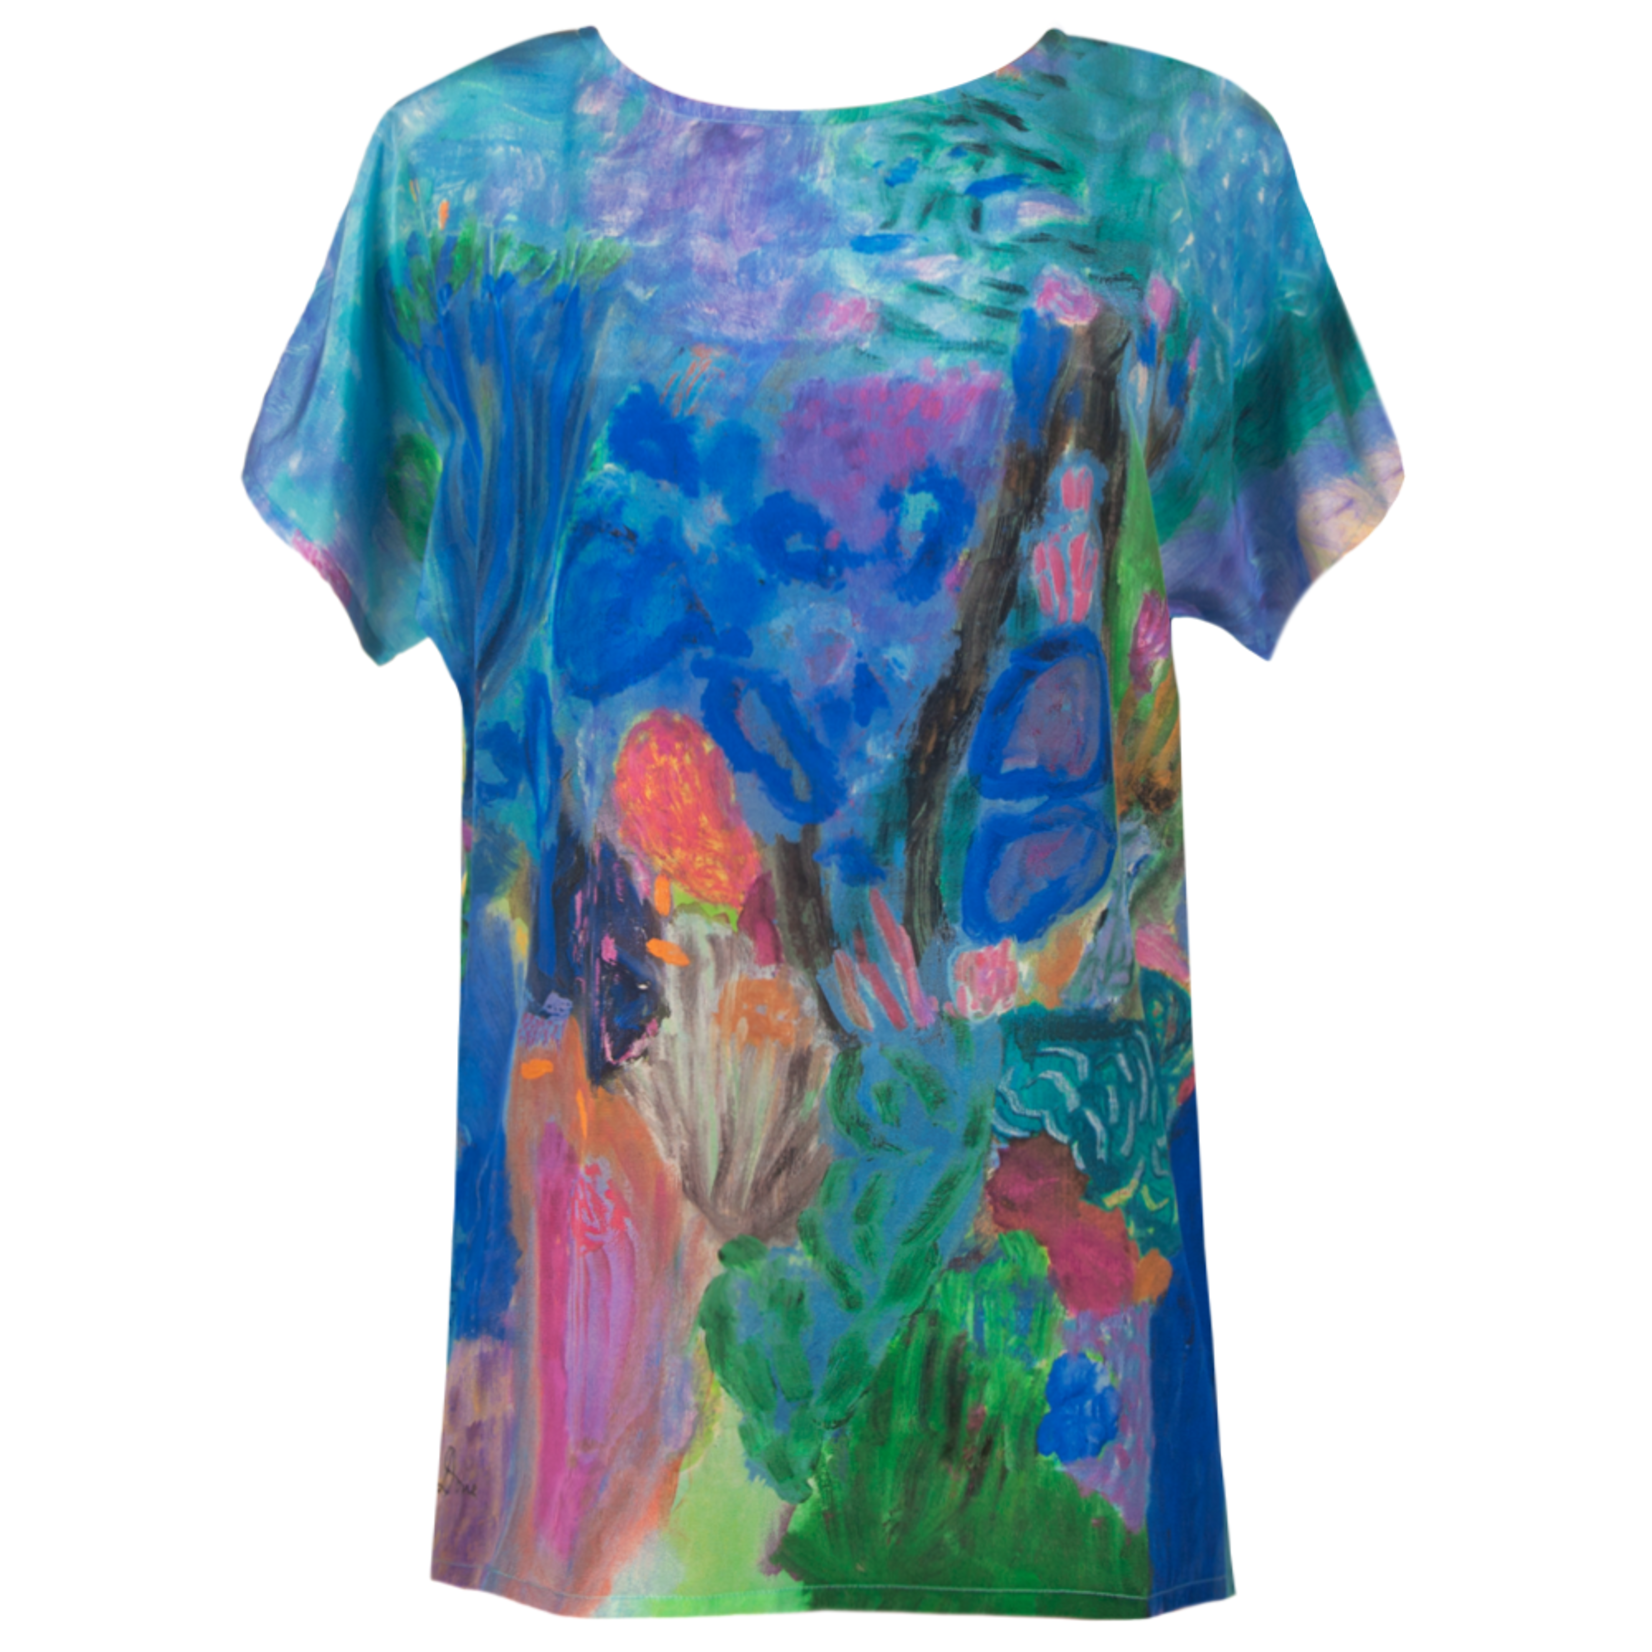 Clothing Art top silk - Ultramarine jade coral head